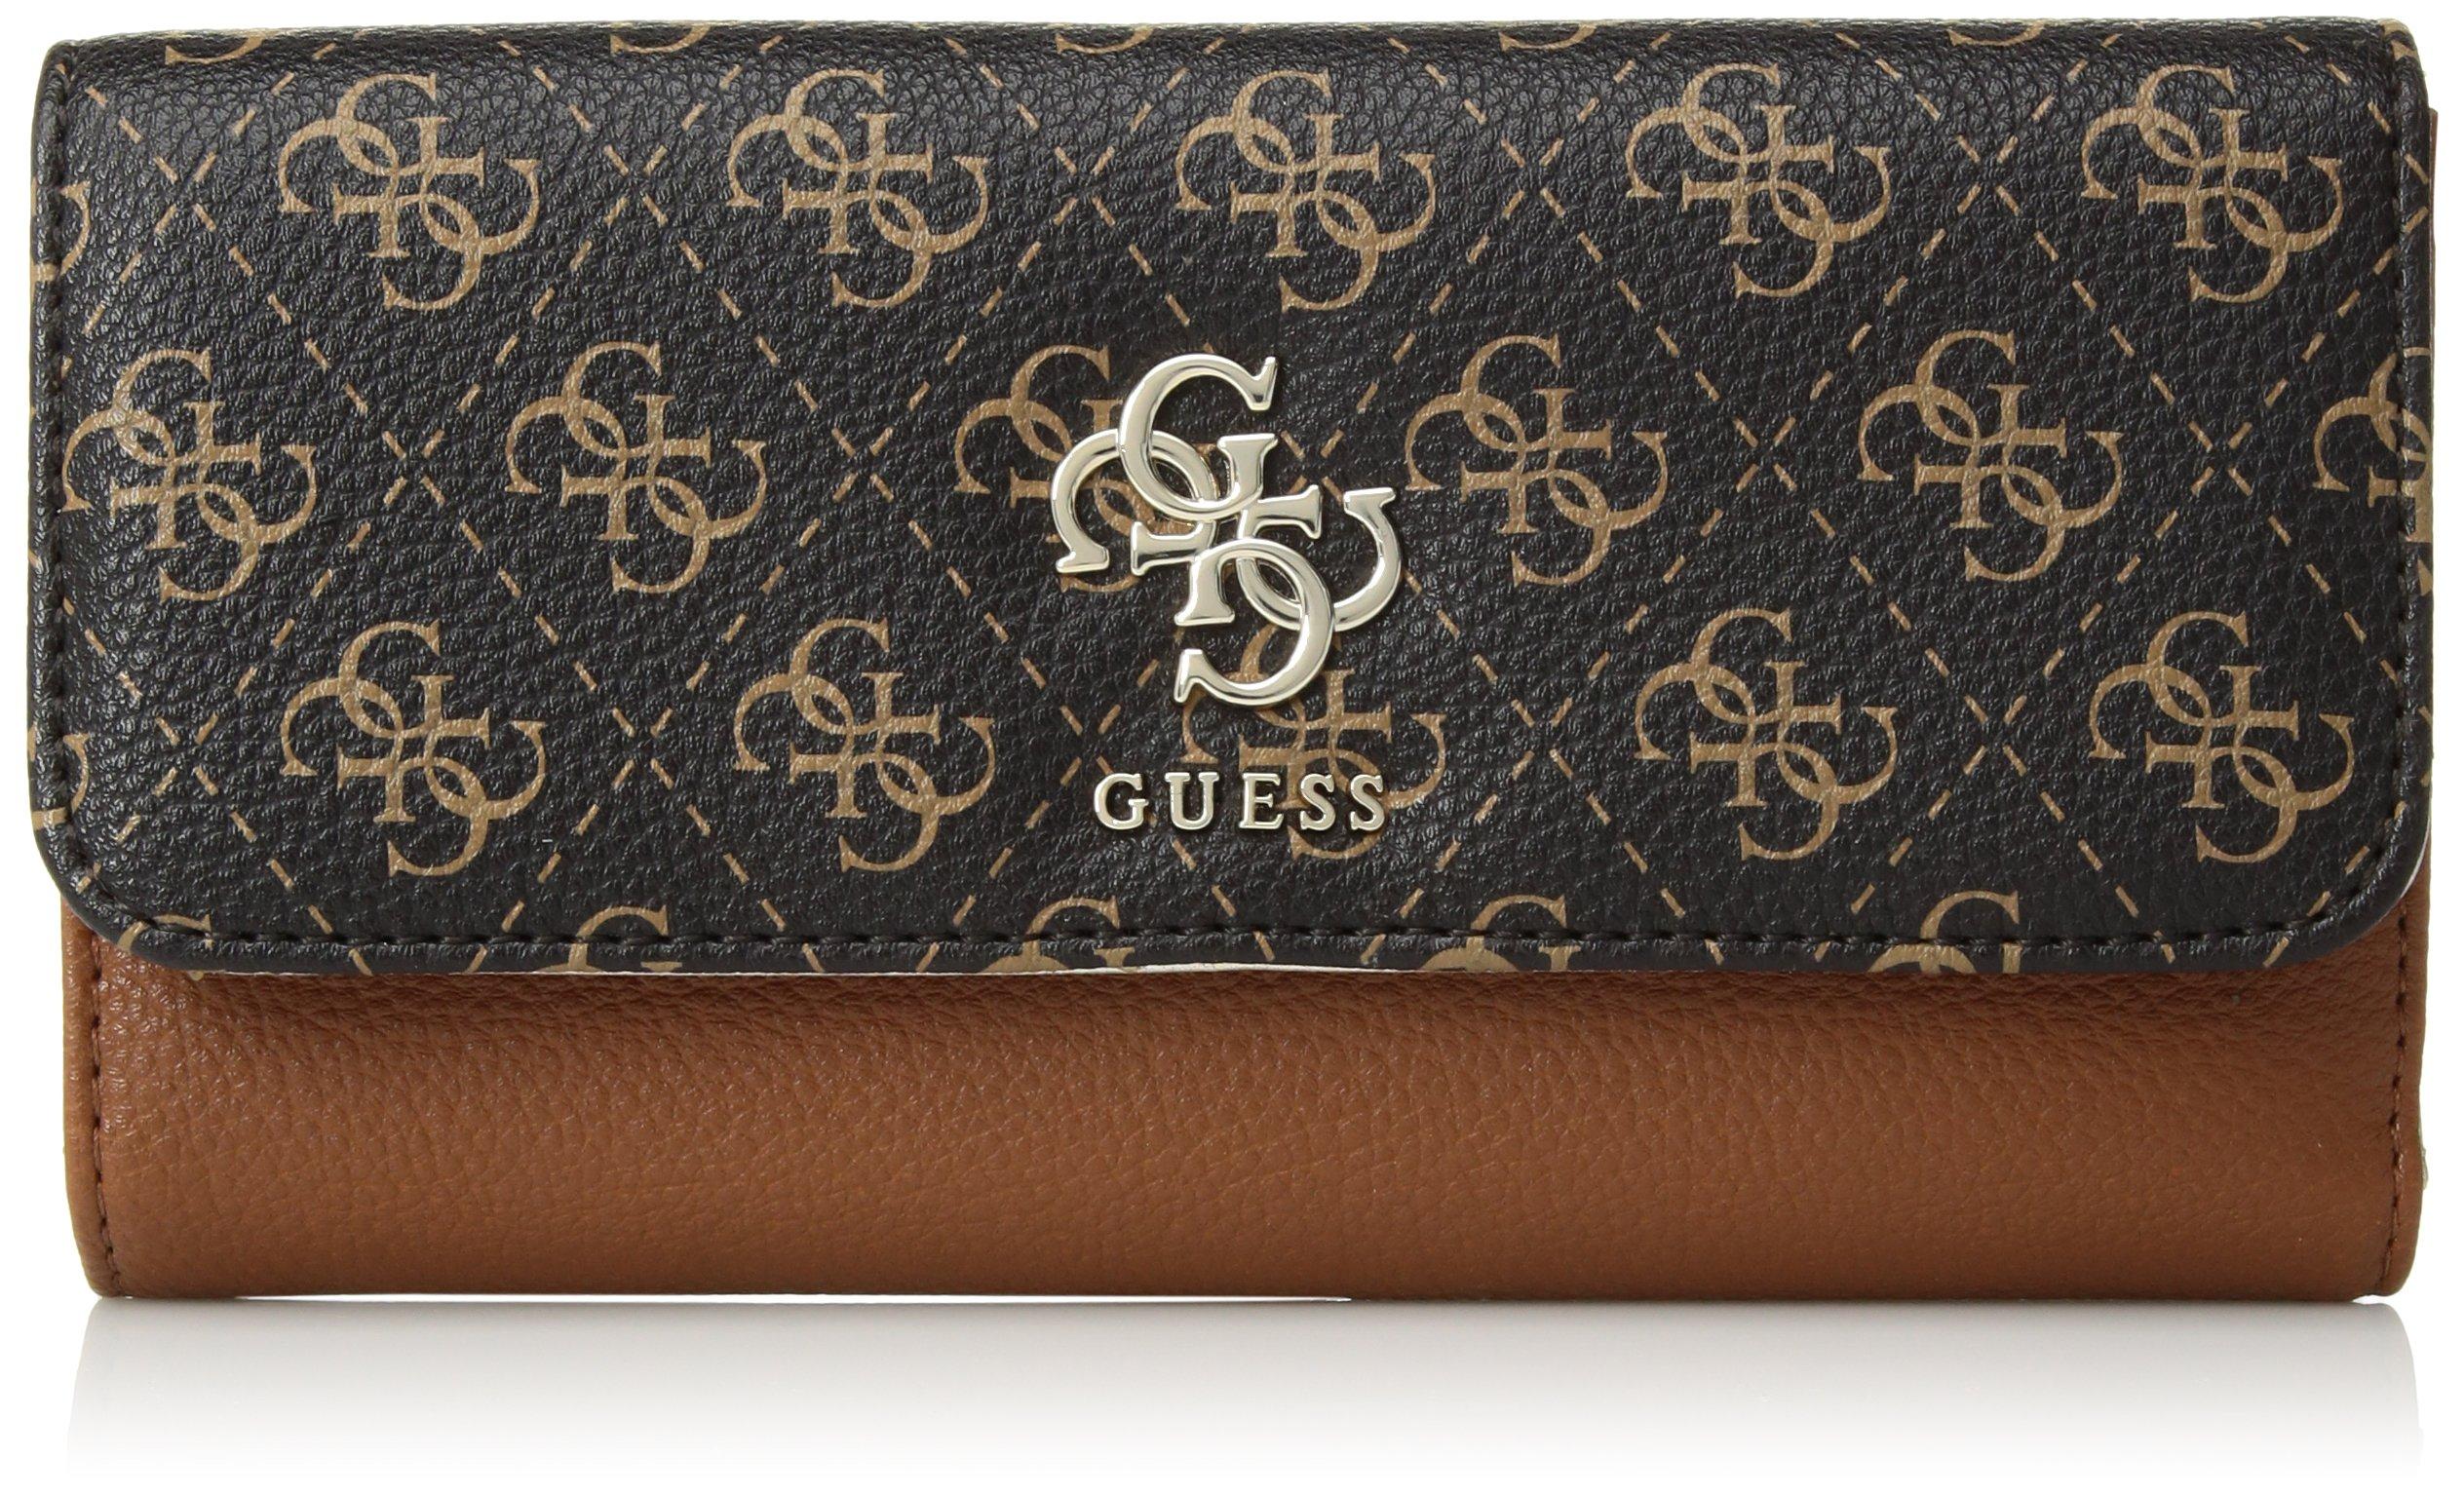 GUESS Digital Multi Clutch Wallet, Cognac Multi